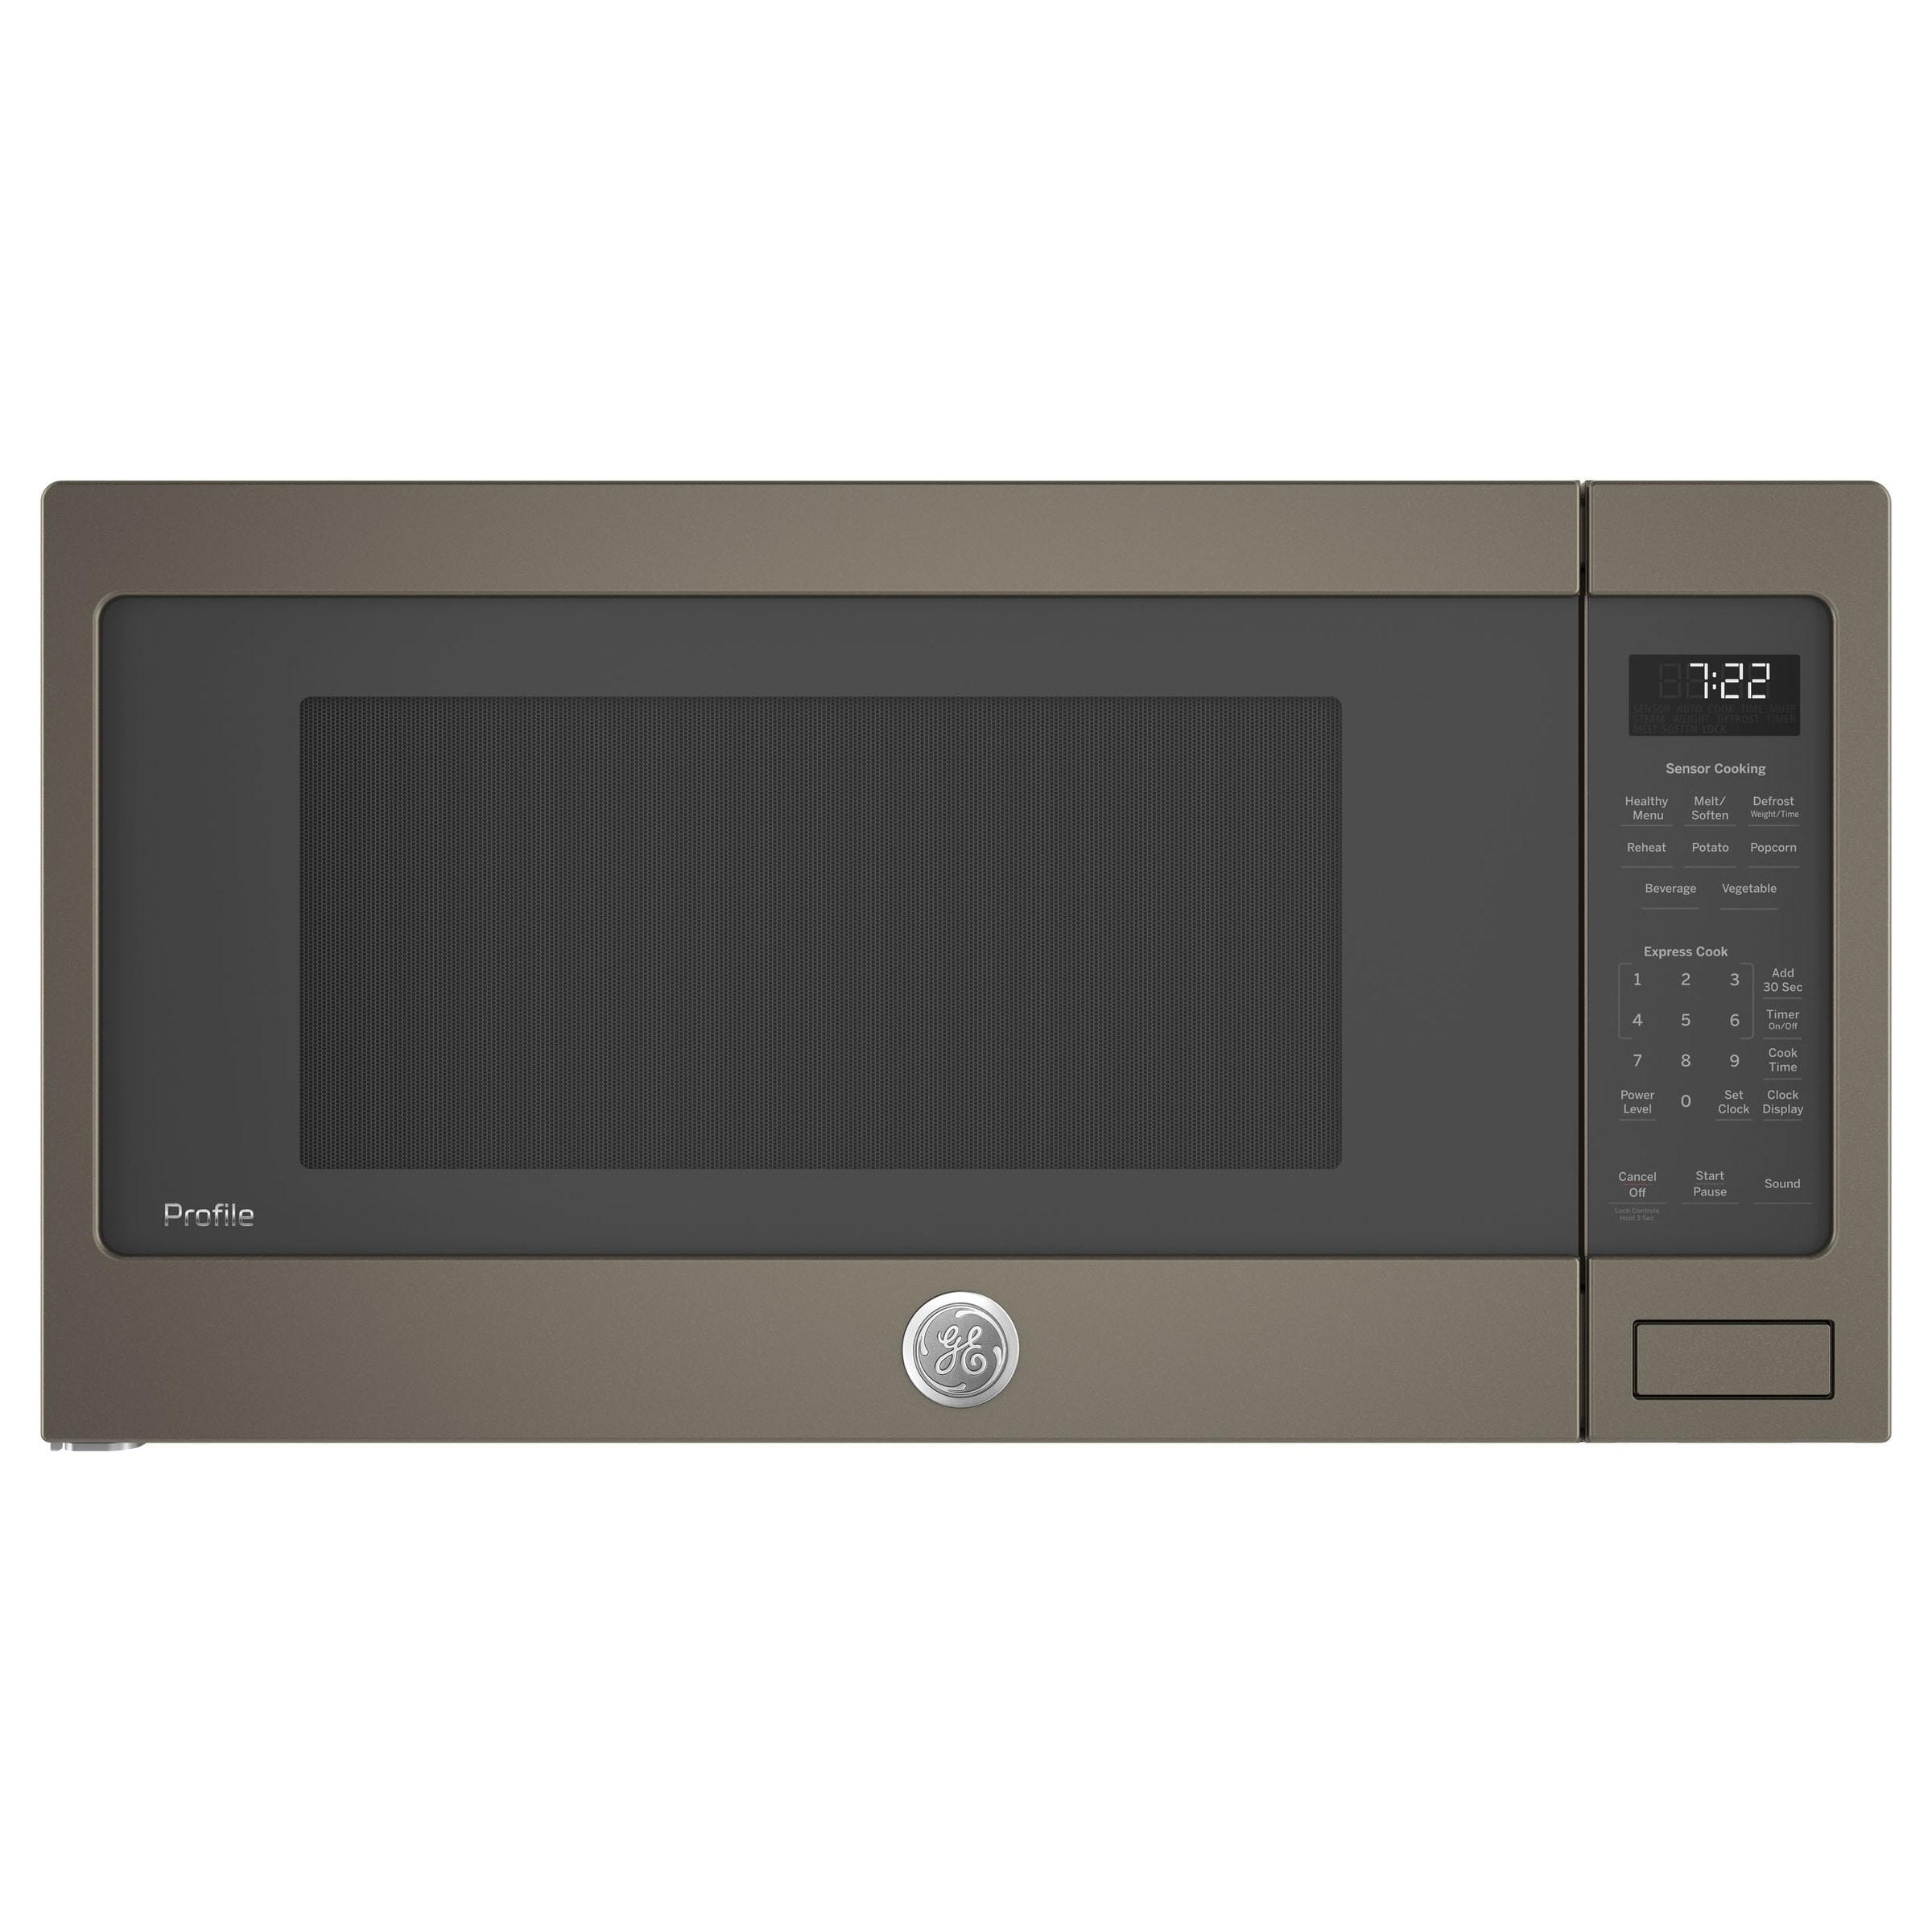 GE Profile Series 2.2 Cu. Ft. Countertop Sensor Microwave Oven in Slate Over 2.0 cf - Grey - Clock Display